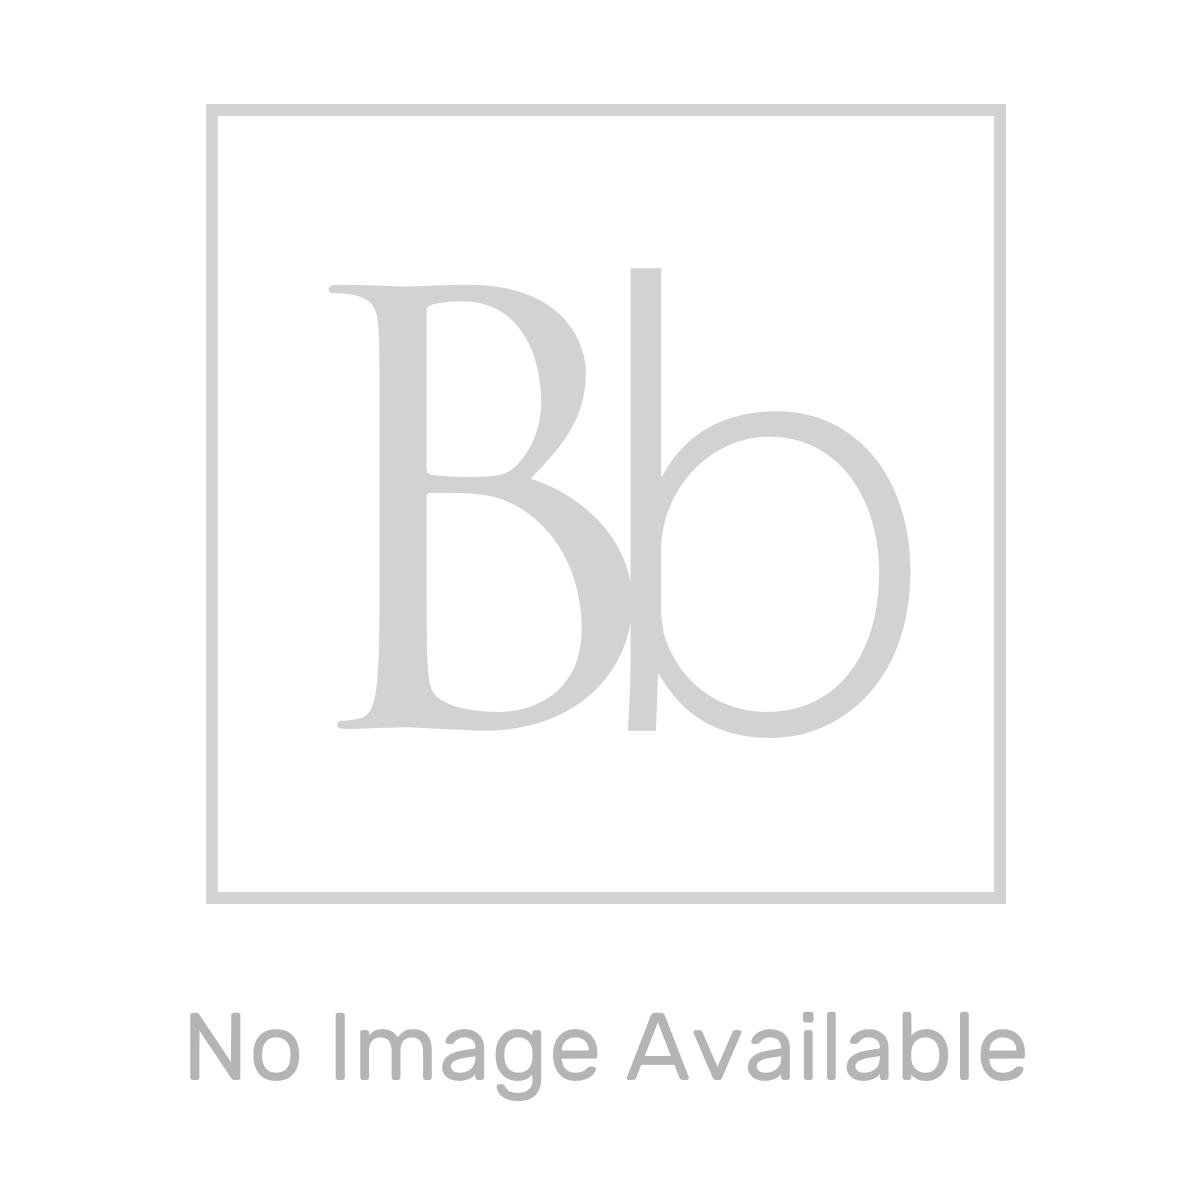 Aquadart White Slate Shower Tray 1400 x 900 Overload